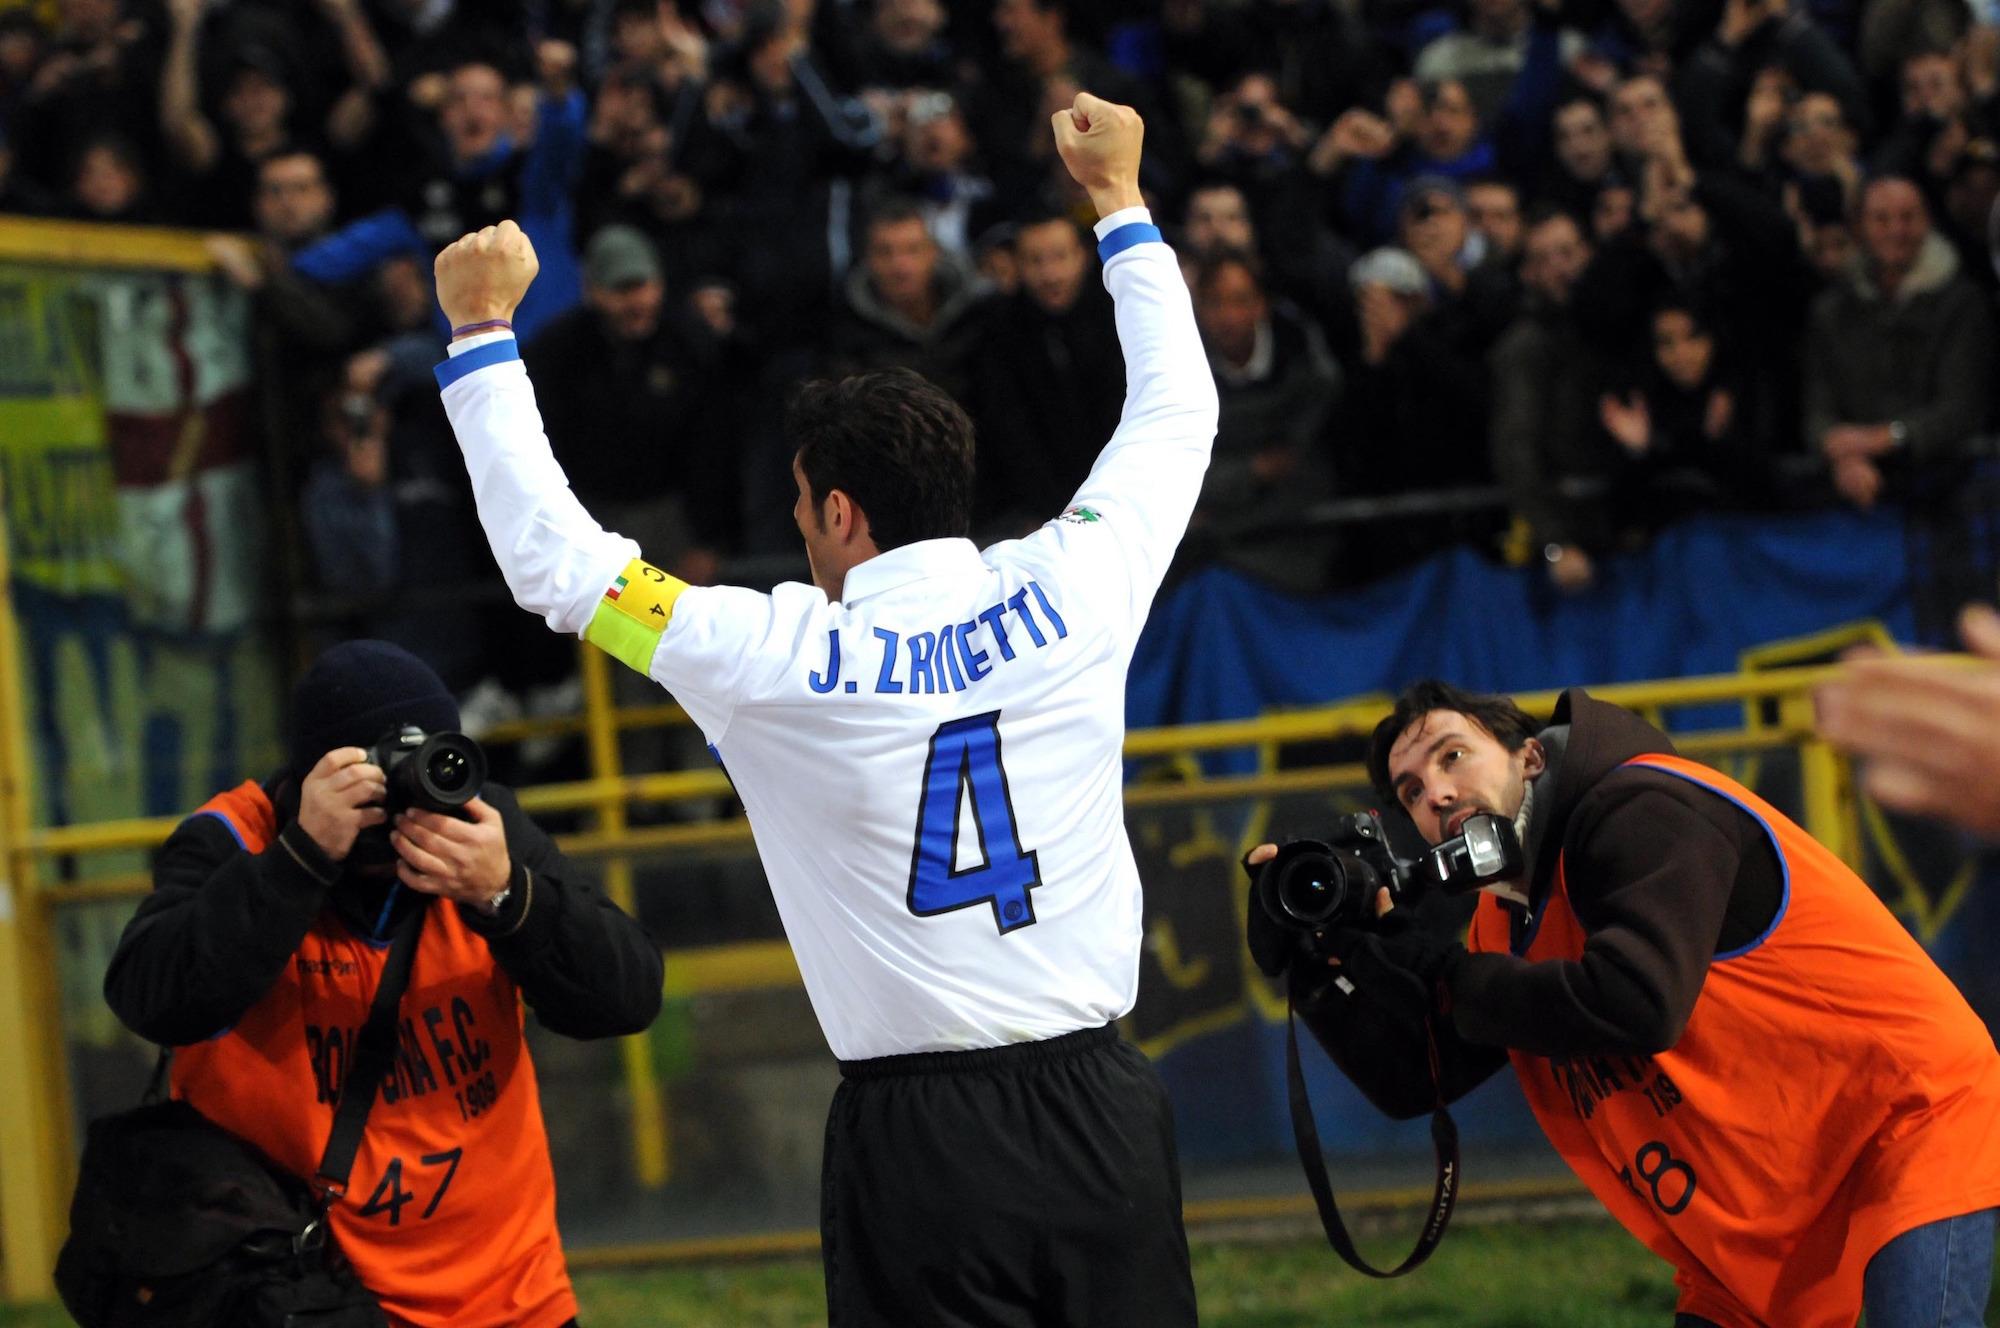 Javier Zanetti Inter Milan and The Rebel Football Match That